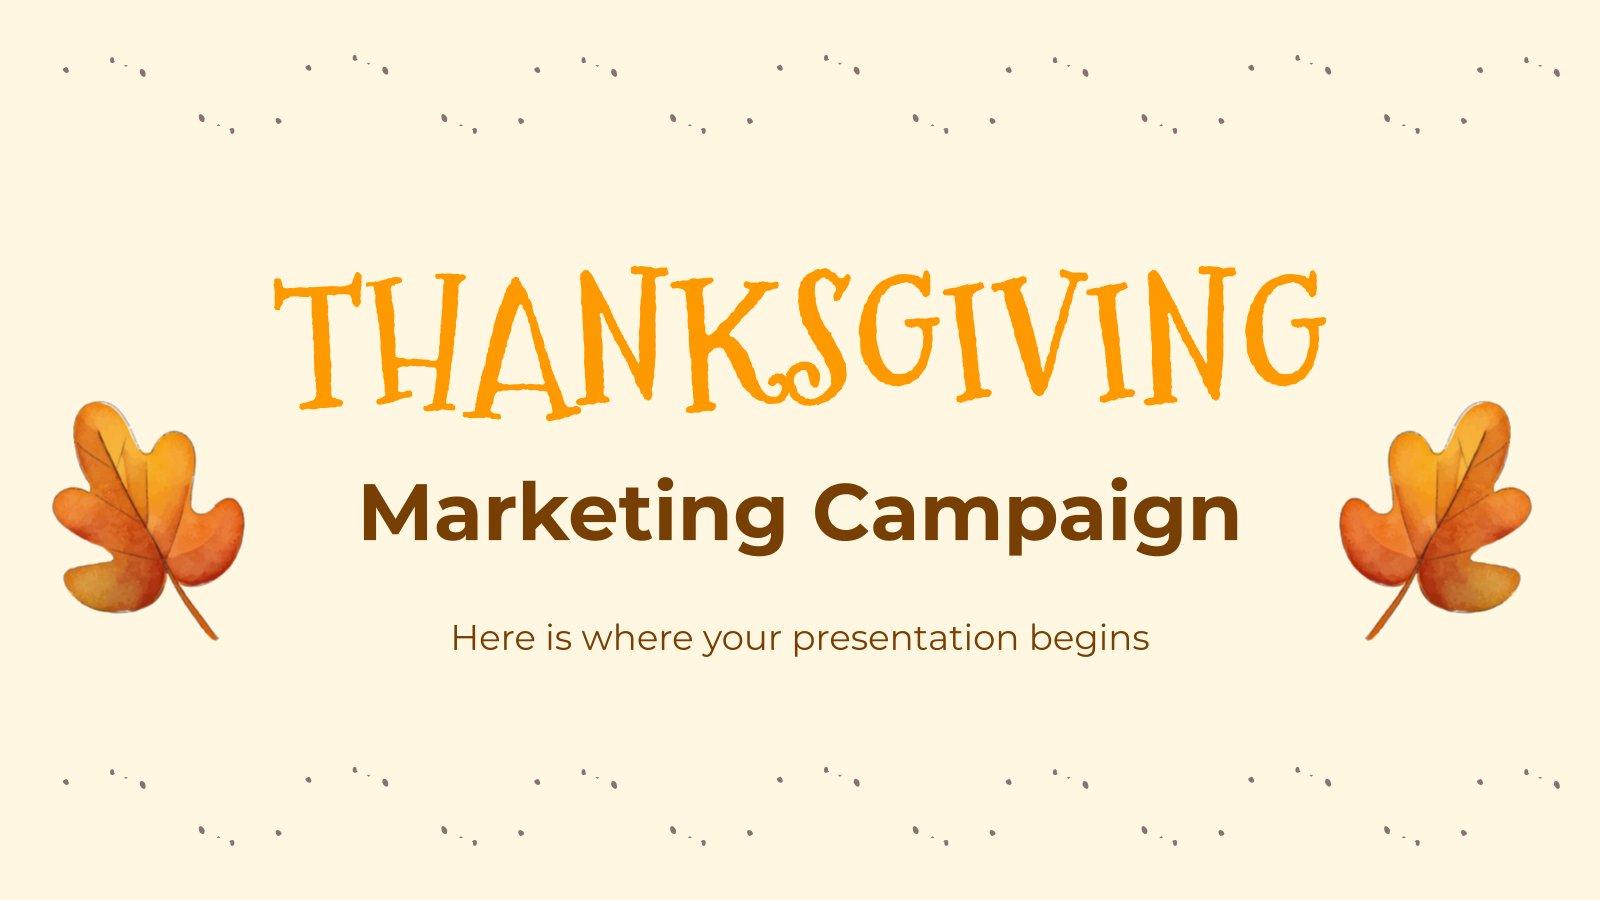 Thanksgiving MK Campaign presentation template